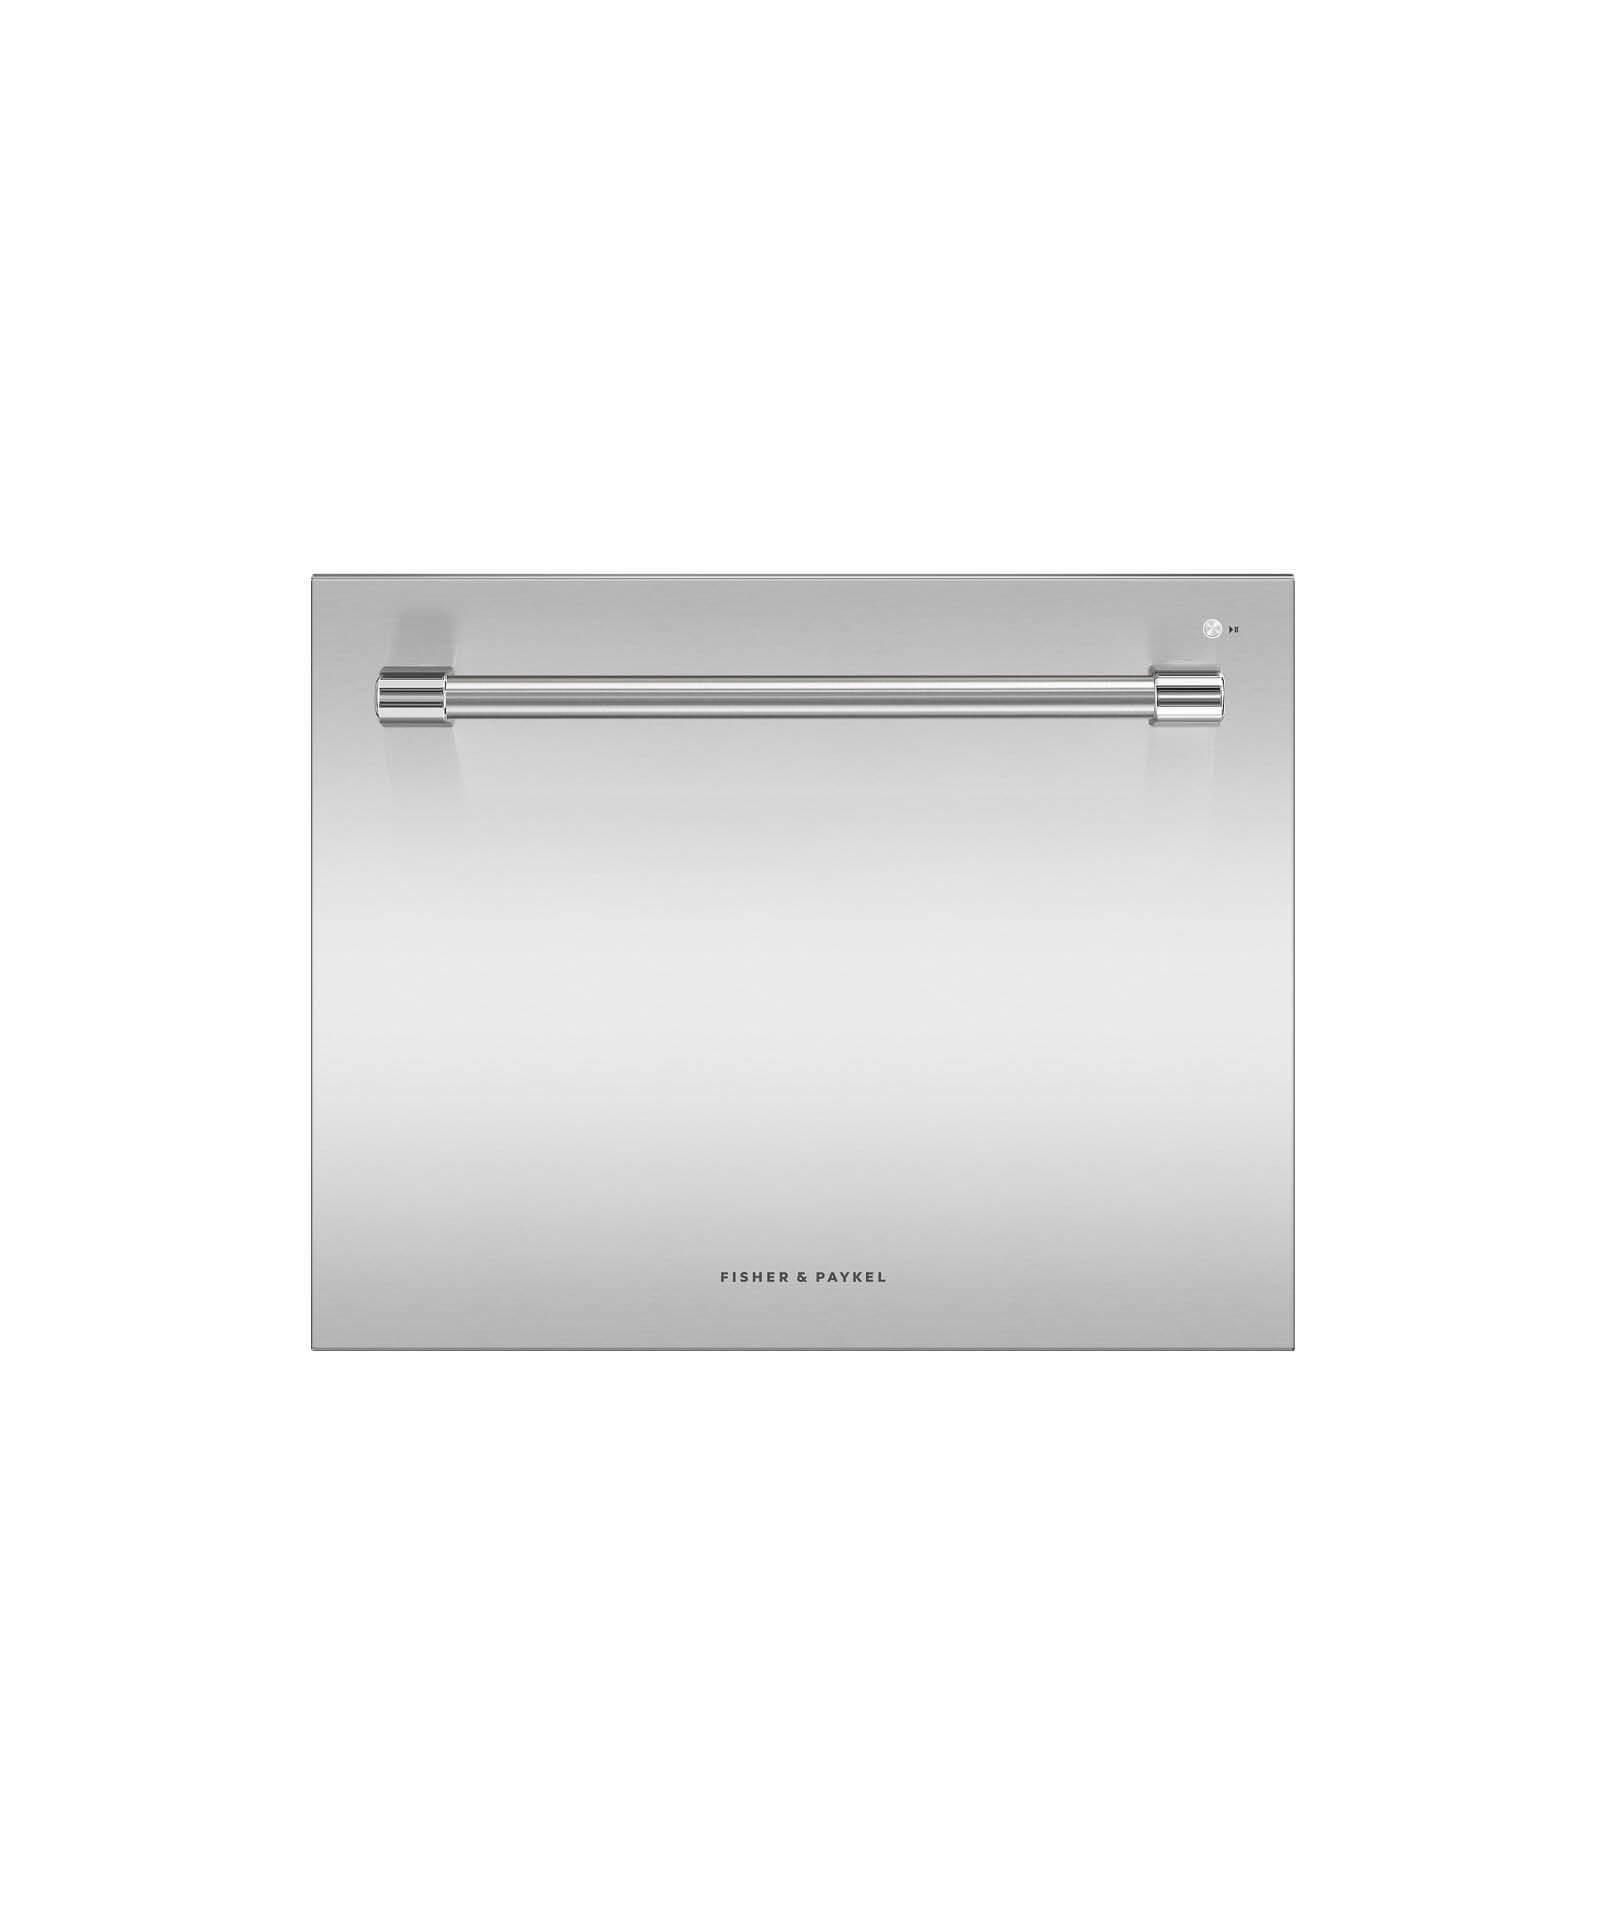 "24"" Single DishDrawer™ Dishwasher, 7 Place Settings, Sanitize (Tall)"